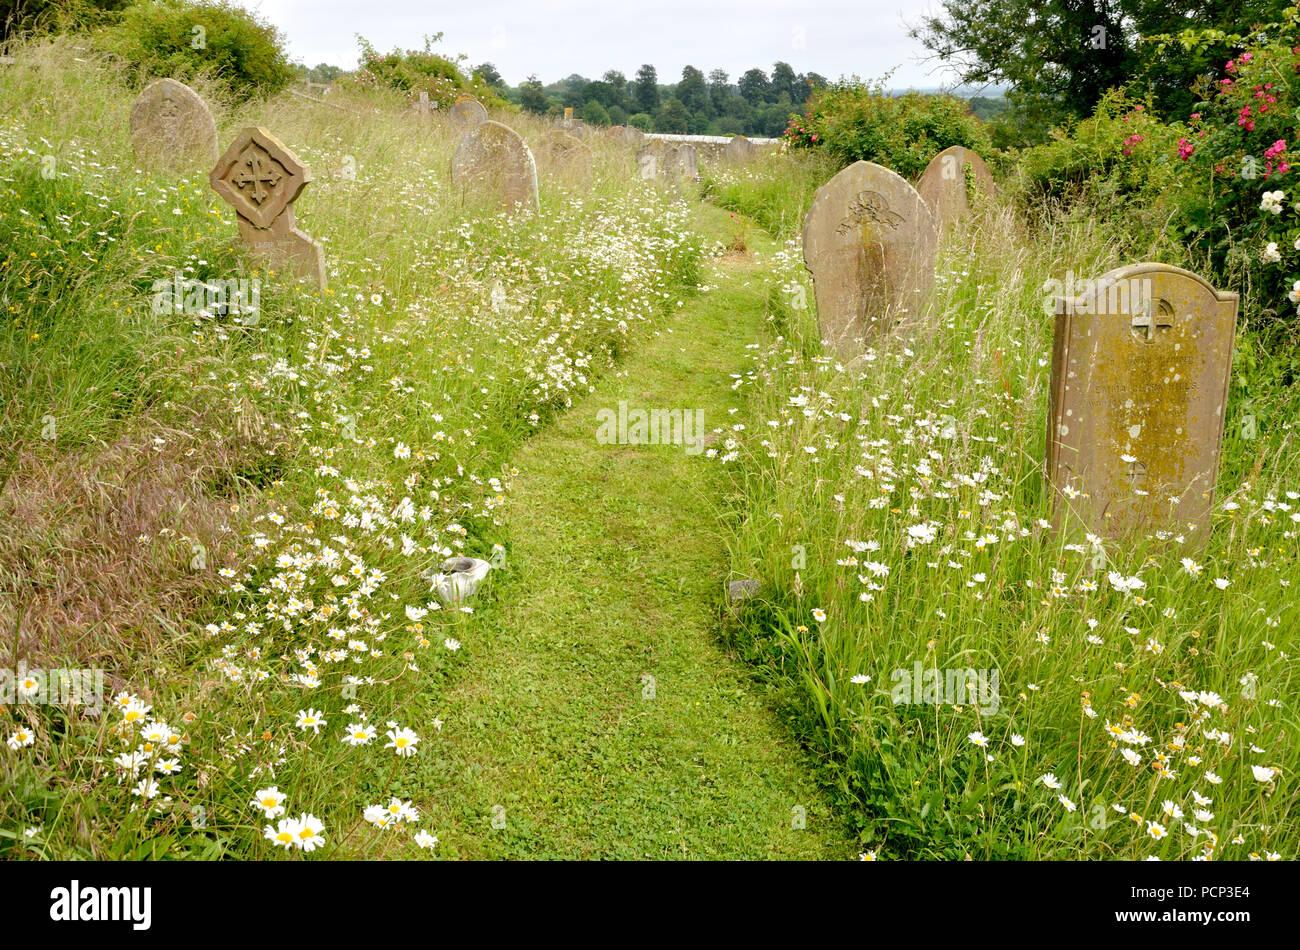 Boughton Monchelsea village, Kent, England. St Peter's Church yard - path cut through the long grass - Stock Image